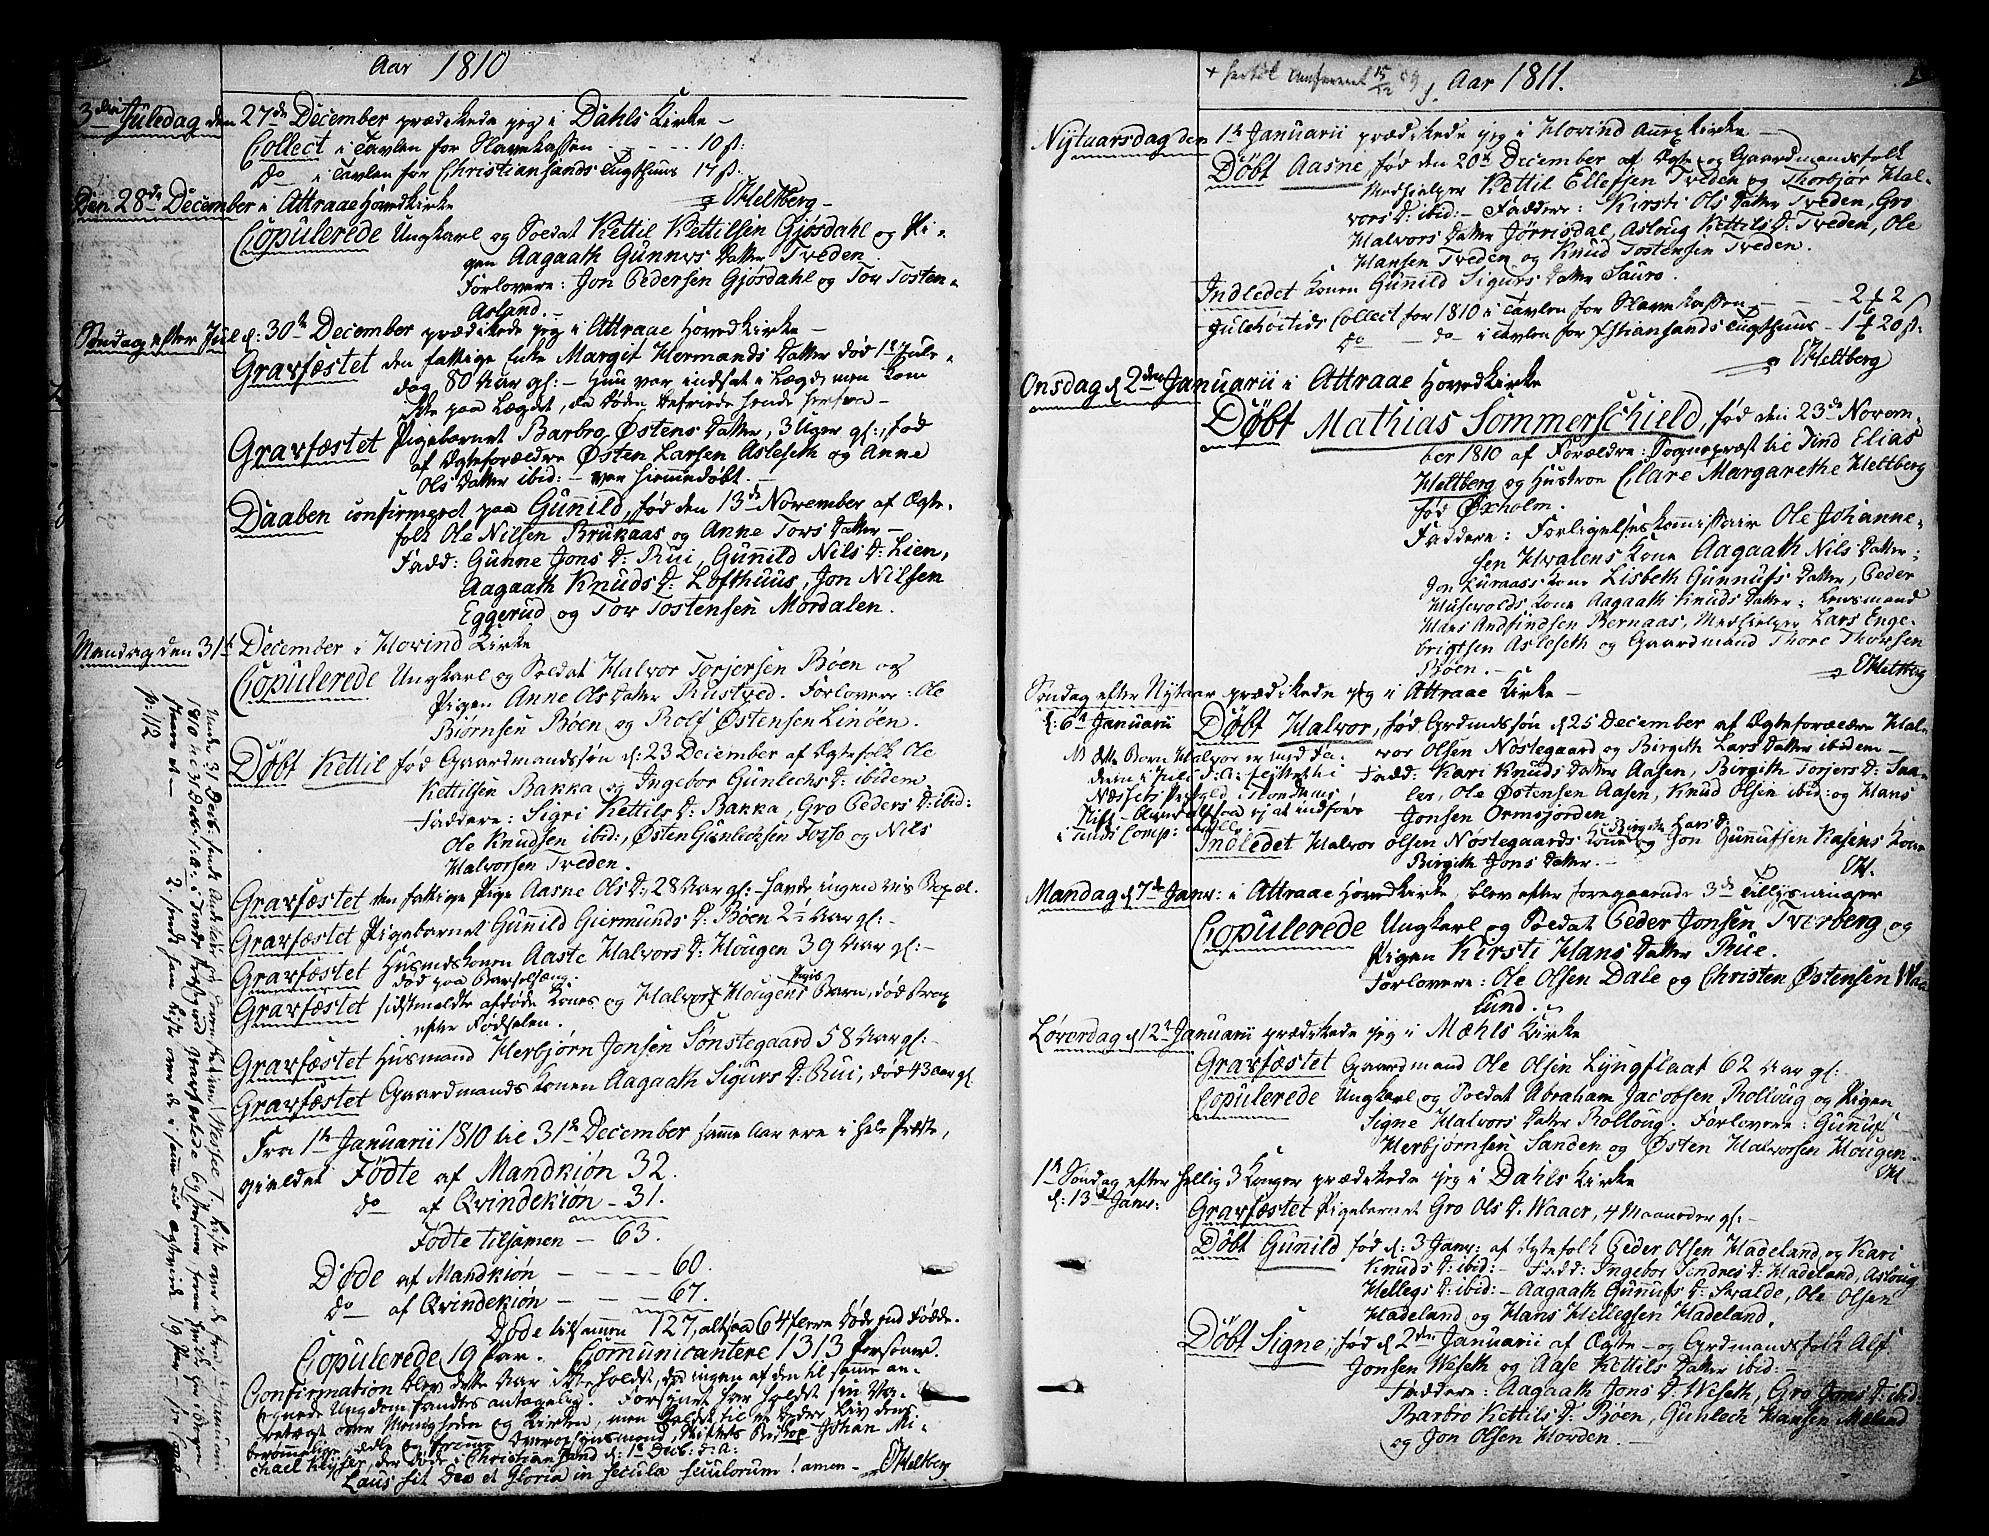 SAKO, Tinn kirkebøker, F/Fa/L0003: Ministerialbok nr. I 3, 1810-1814, s. 18-19